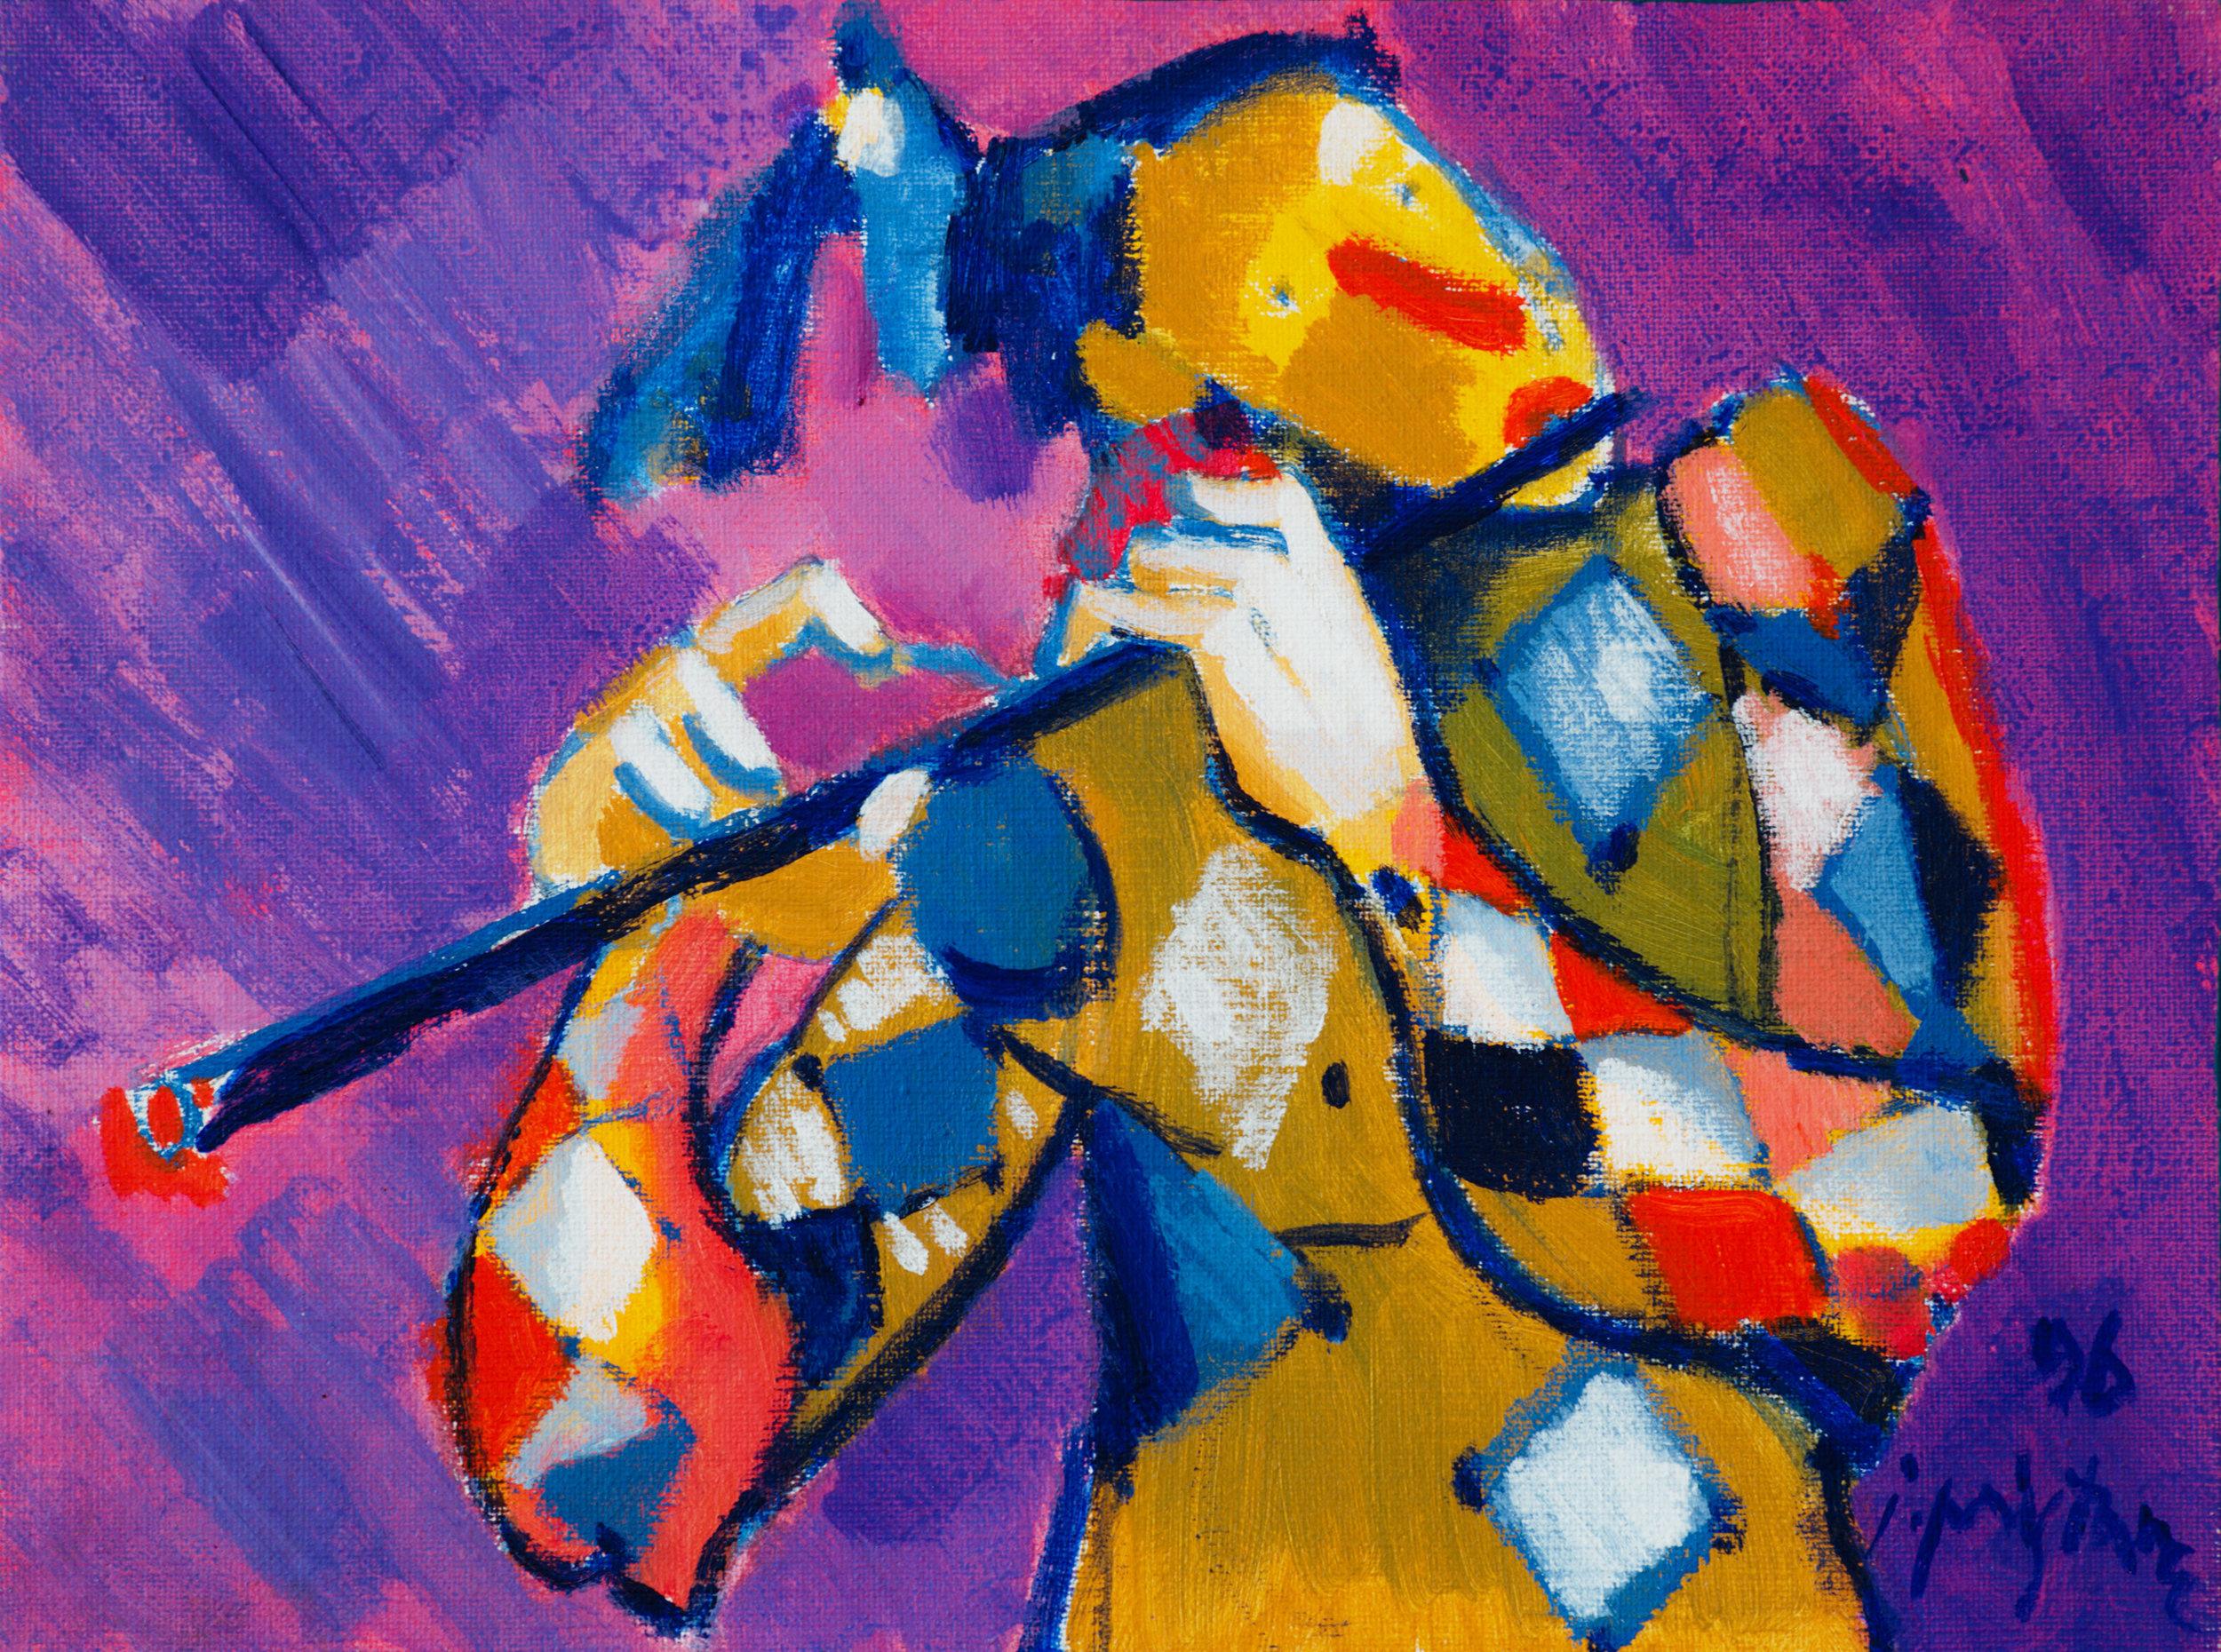 Fiddler / 1996 / oil on canvas / 40x30 cm